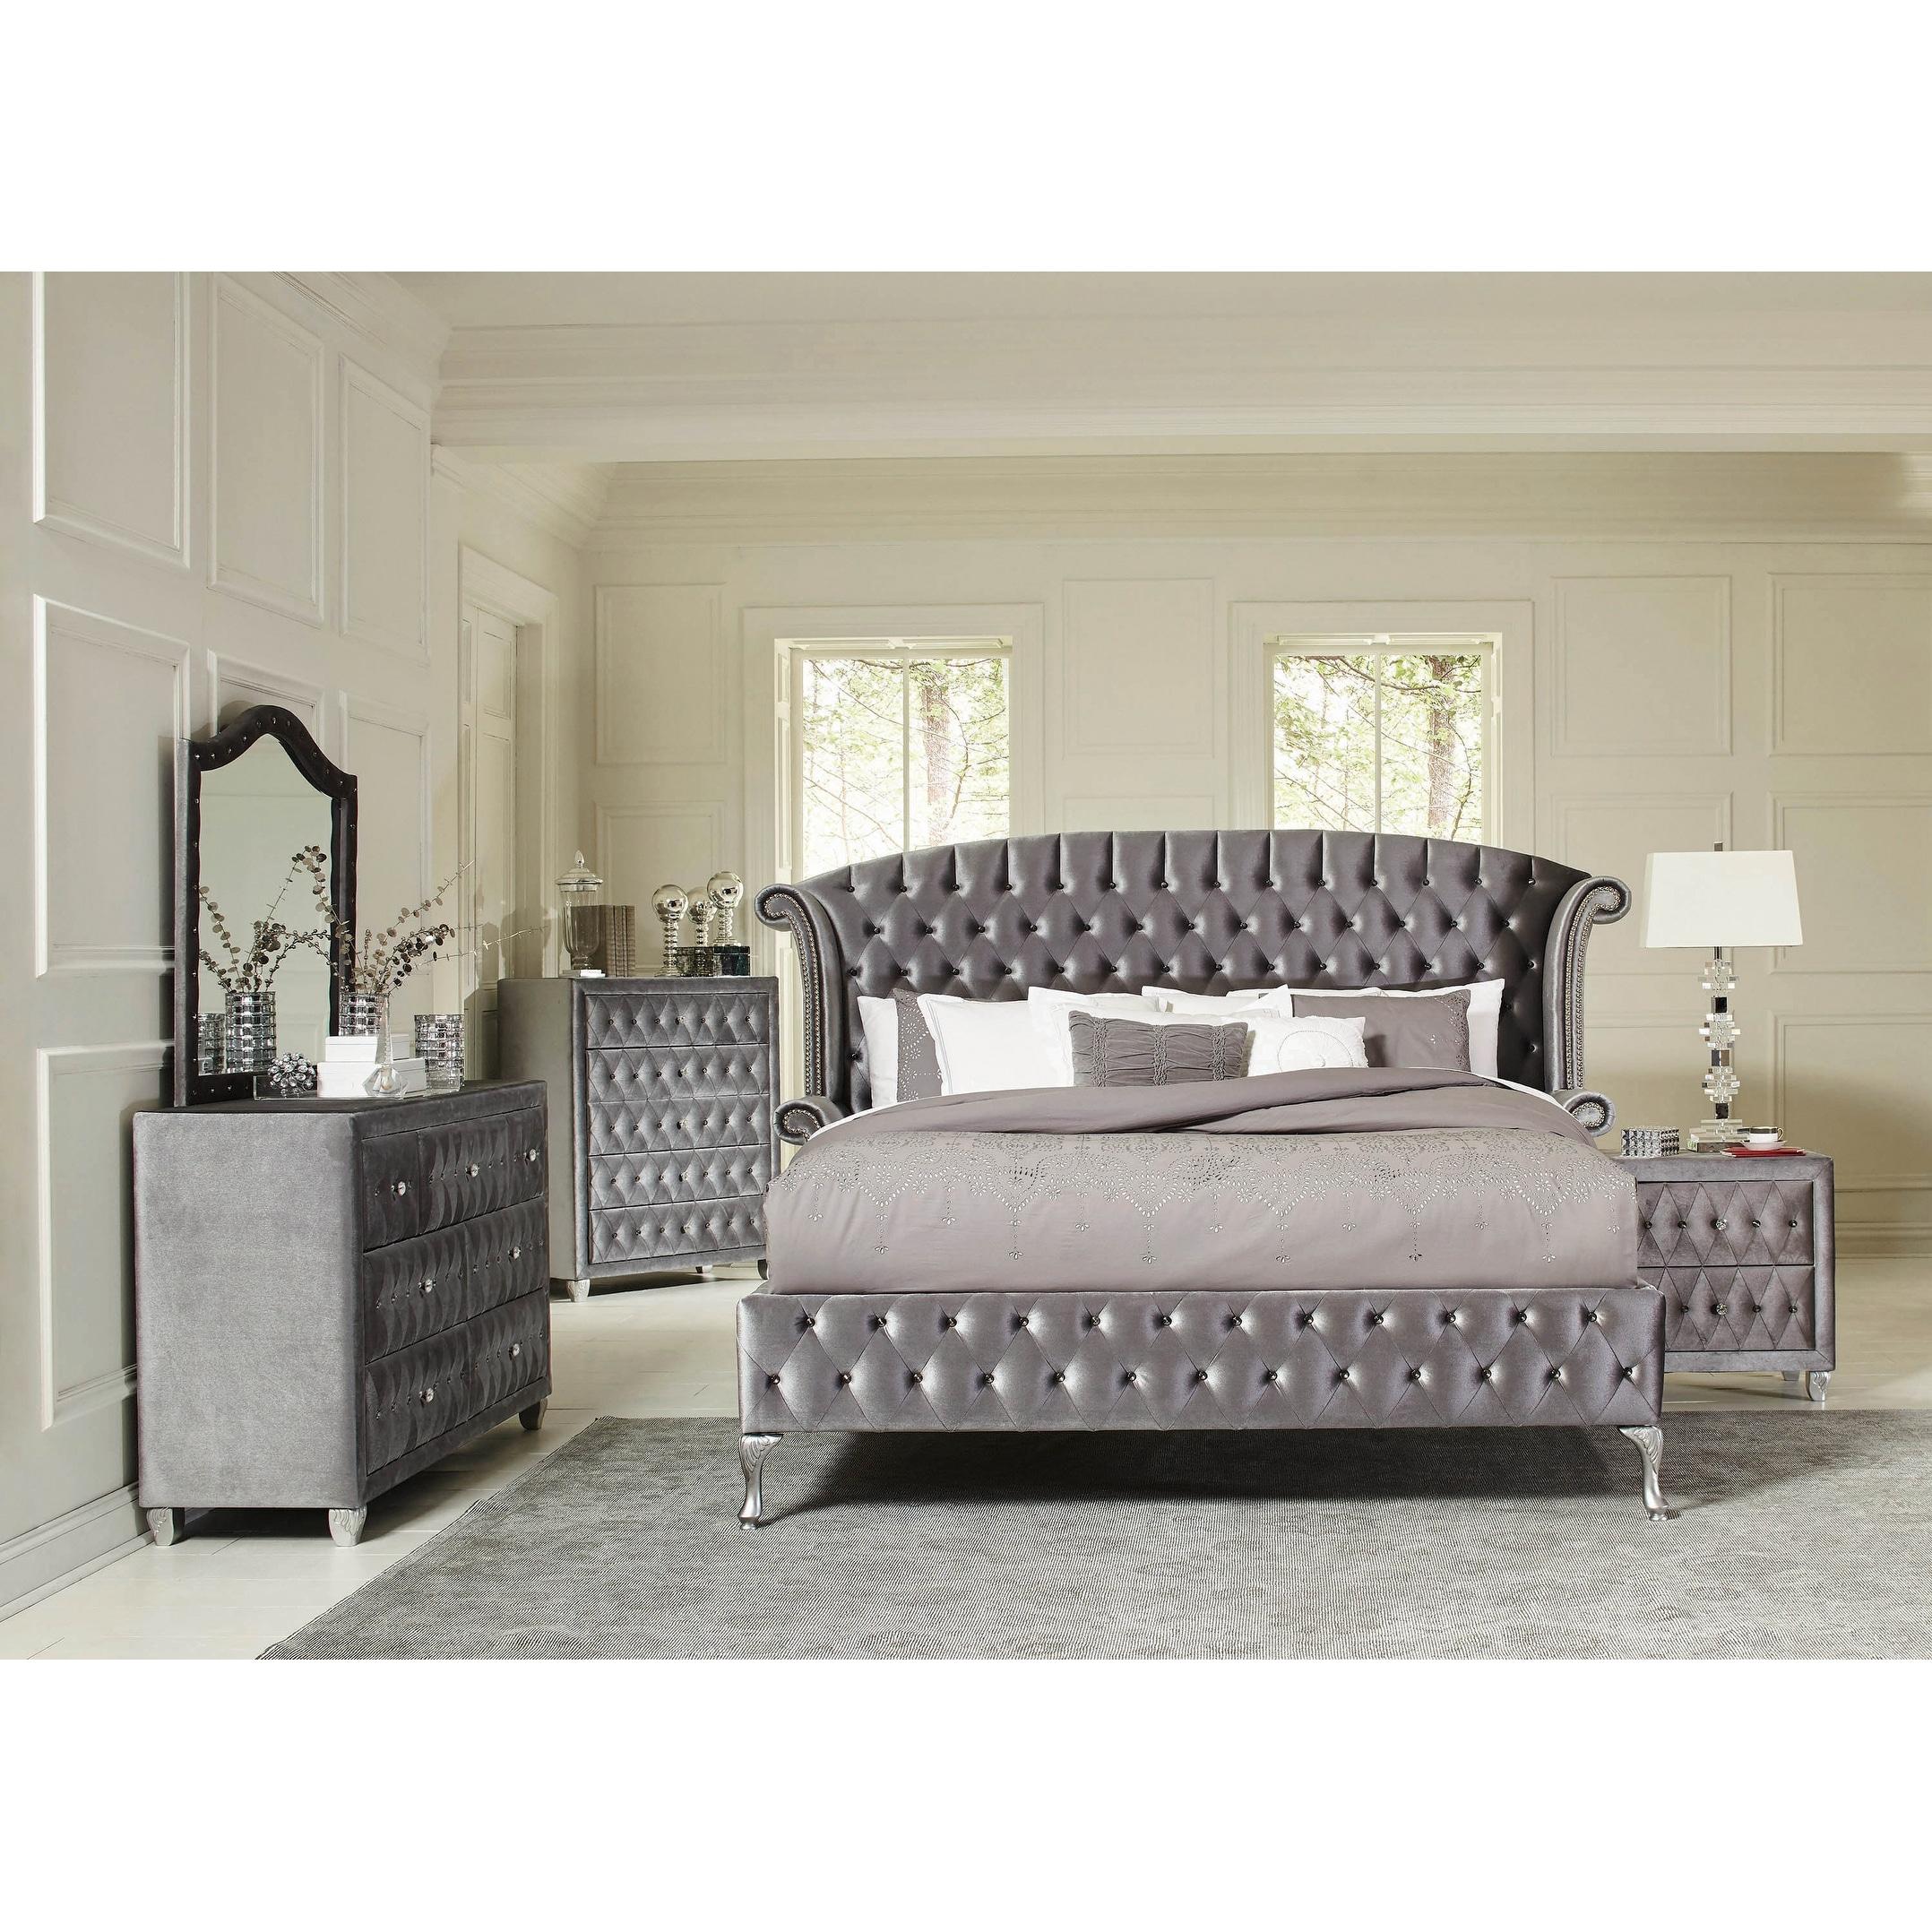 Audrey Grey 5-piece Upholstered Bedroom Set